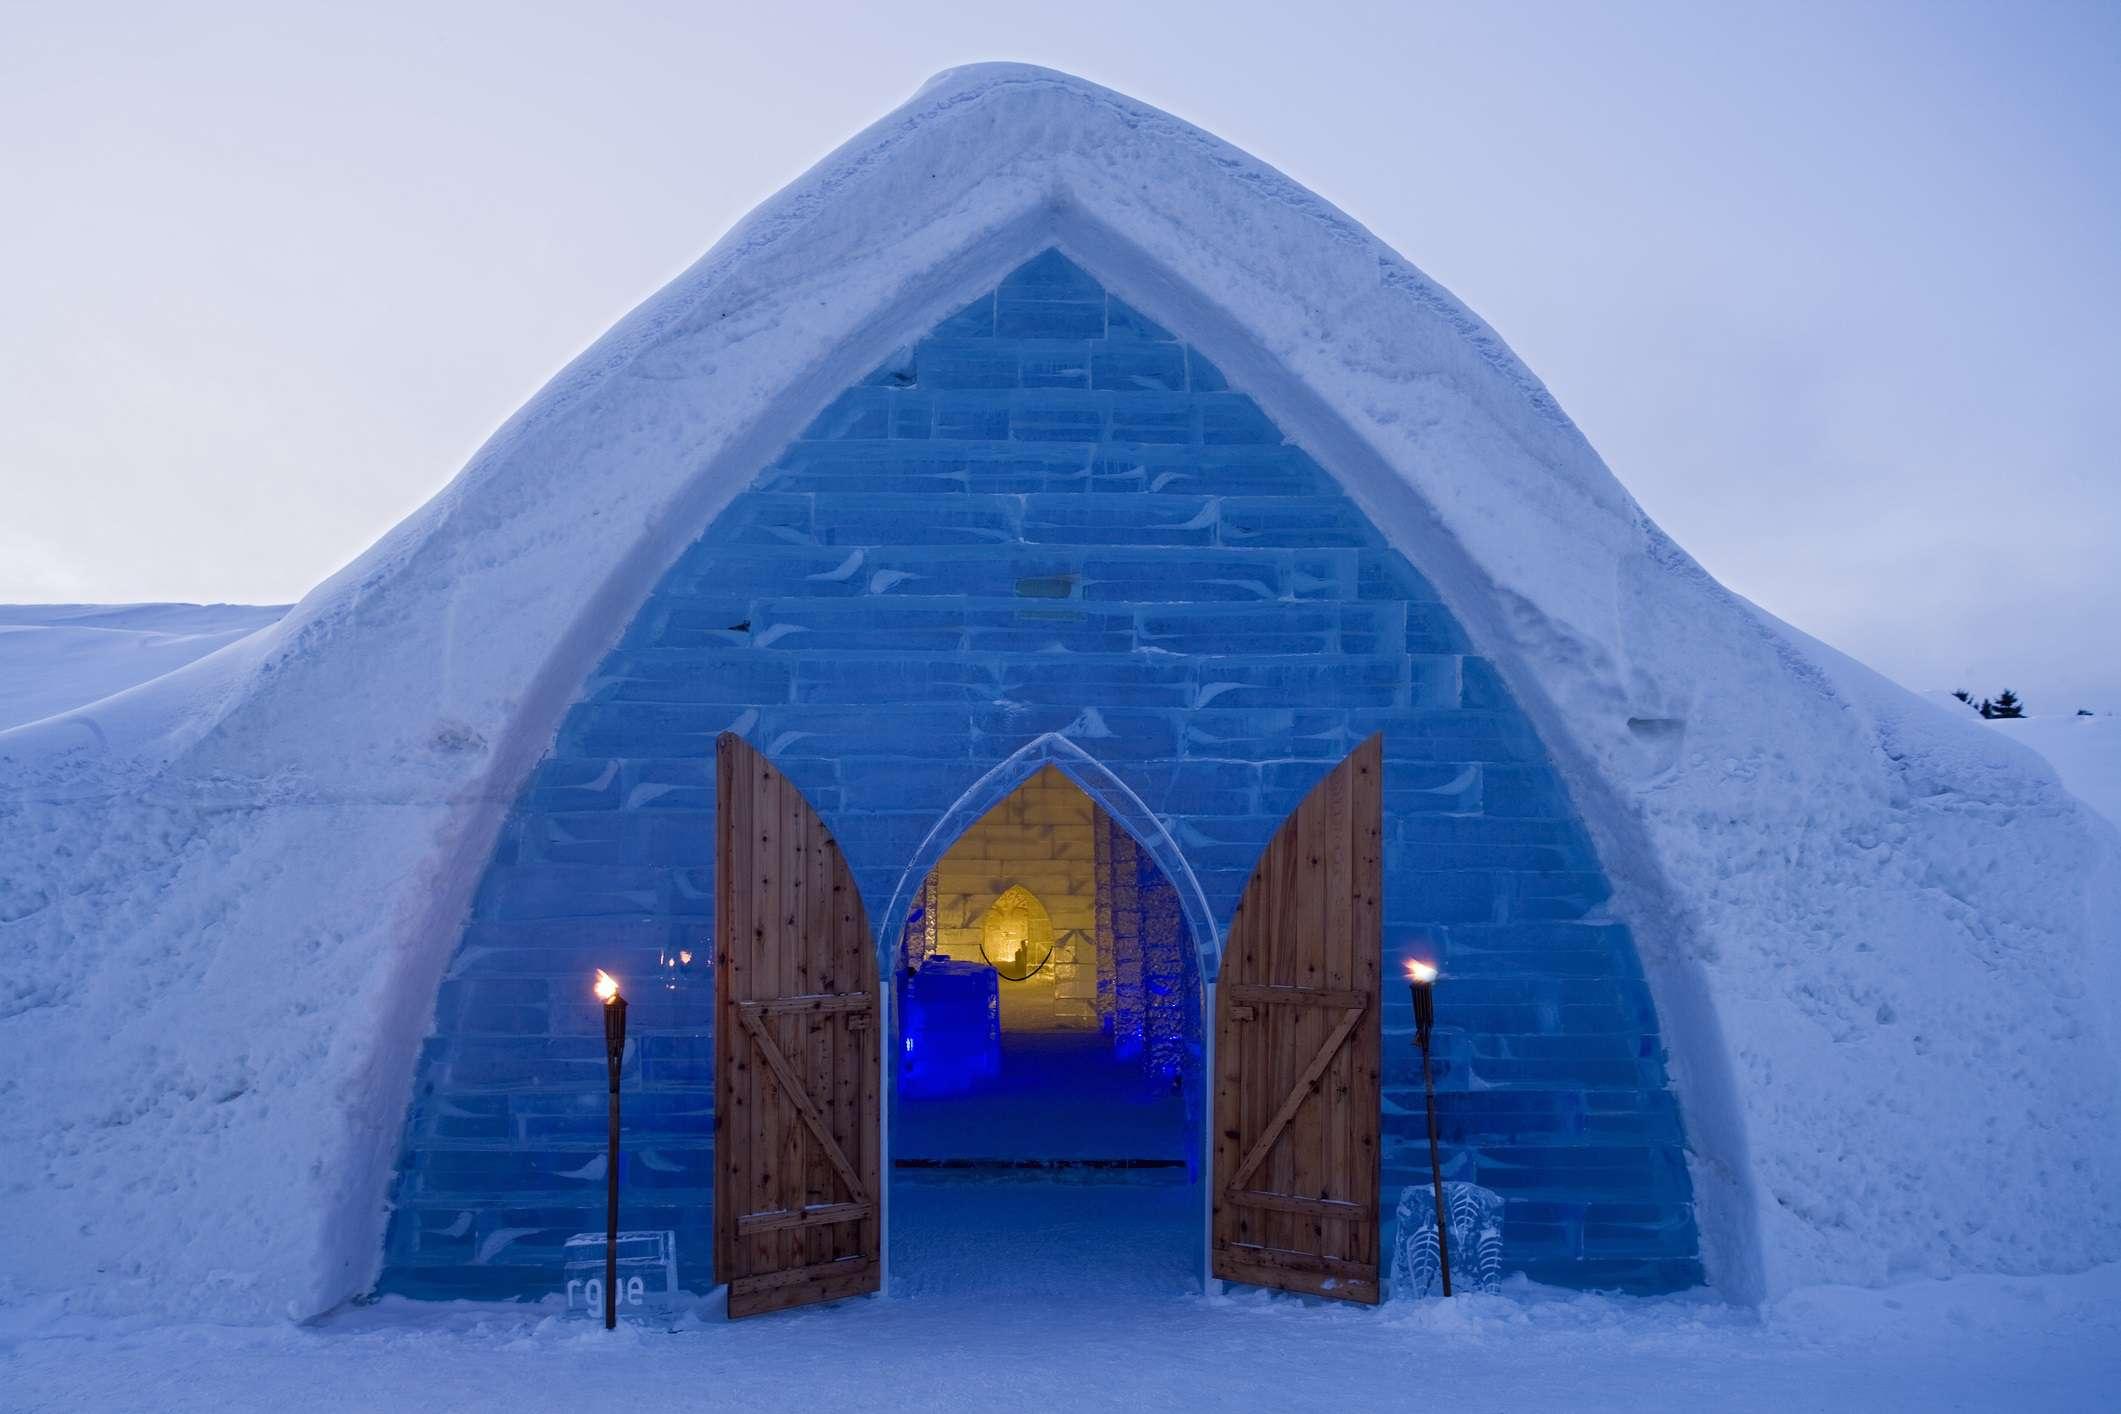 Sainte Catherine de la Jacques Cartier, Ice Hotel